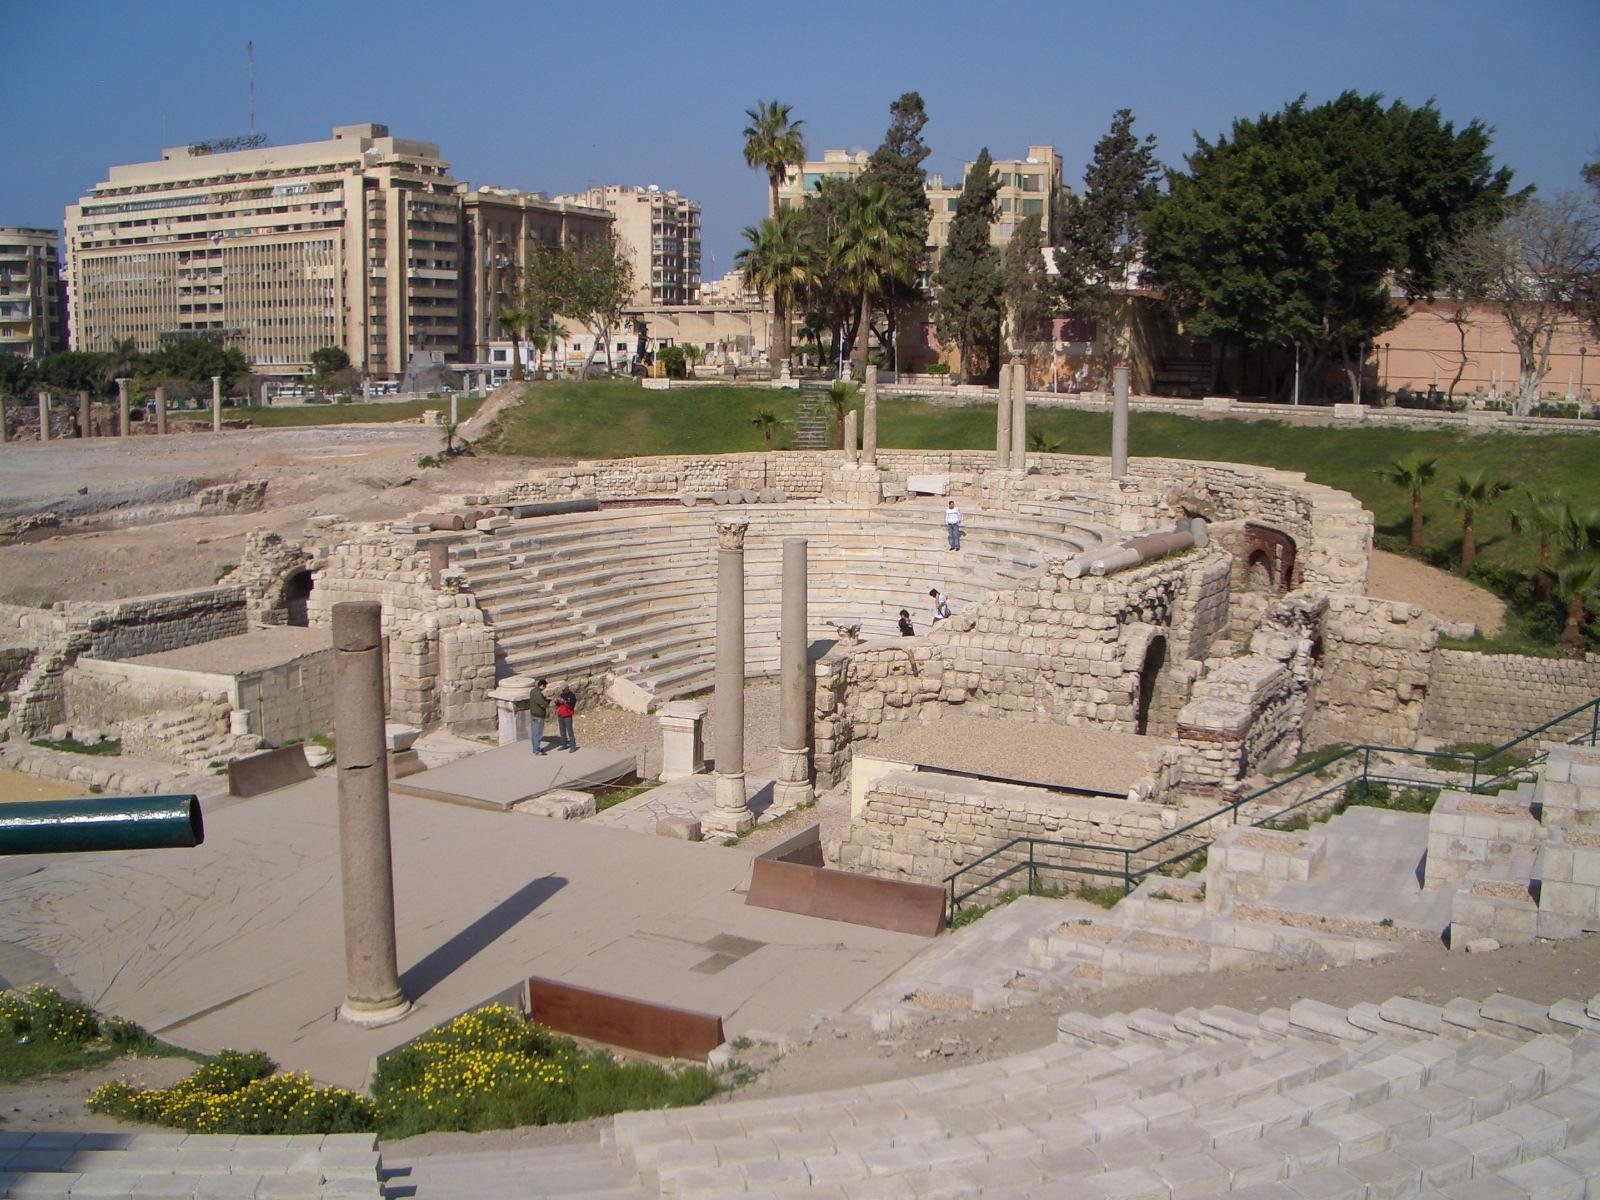 http://image.nauka.bg/history/arch/The_Roman_Theatre_in_Alexandria.JPG